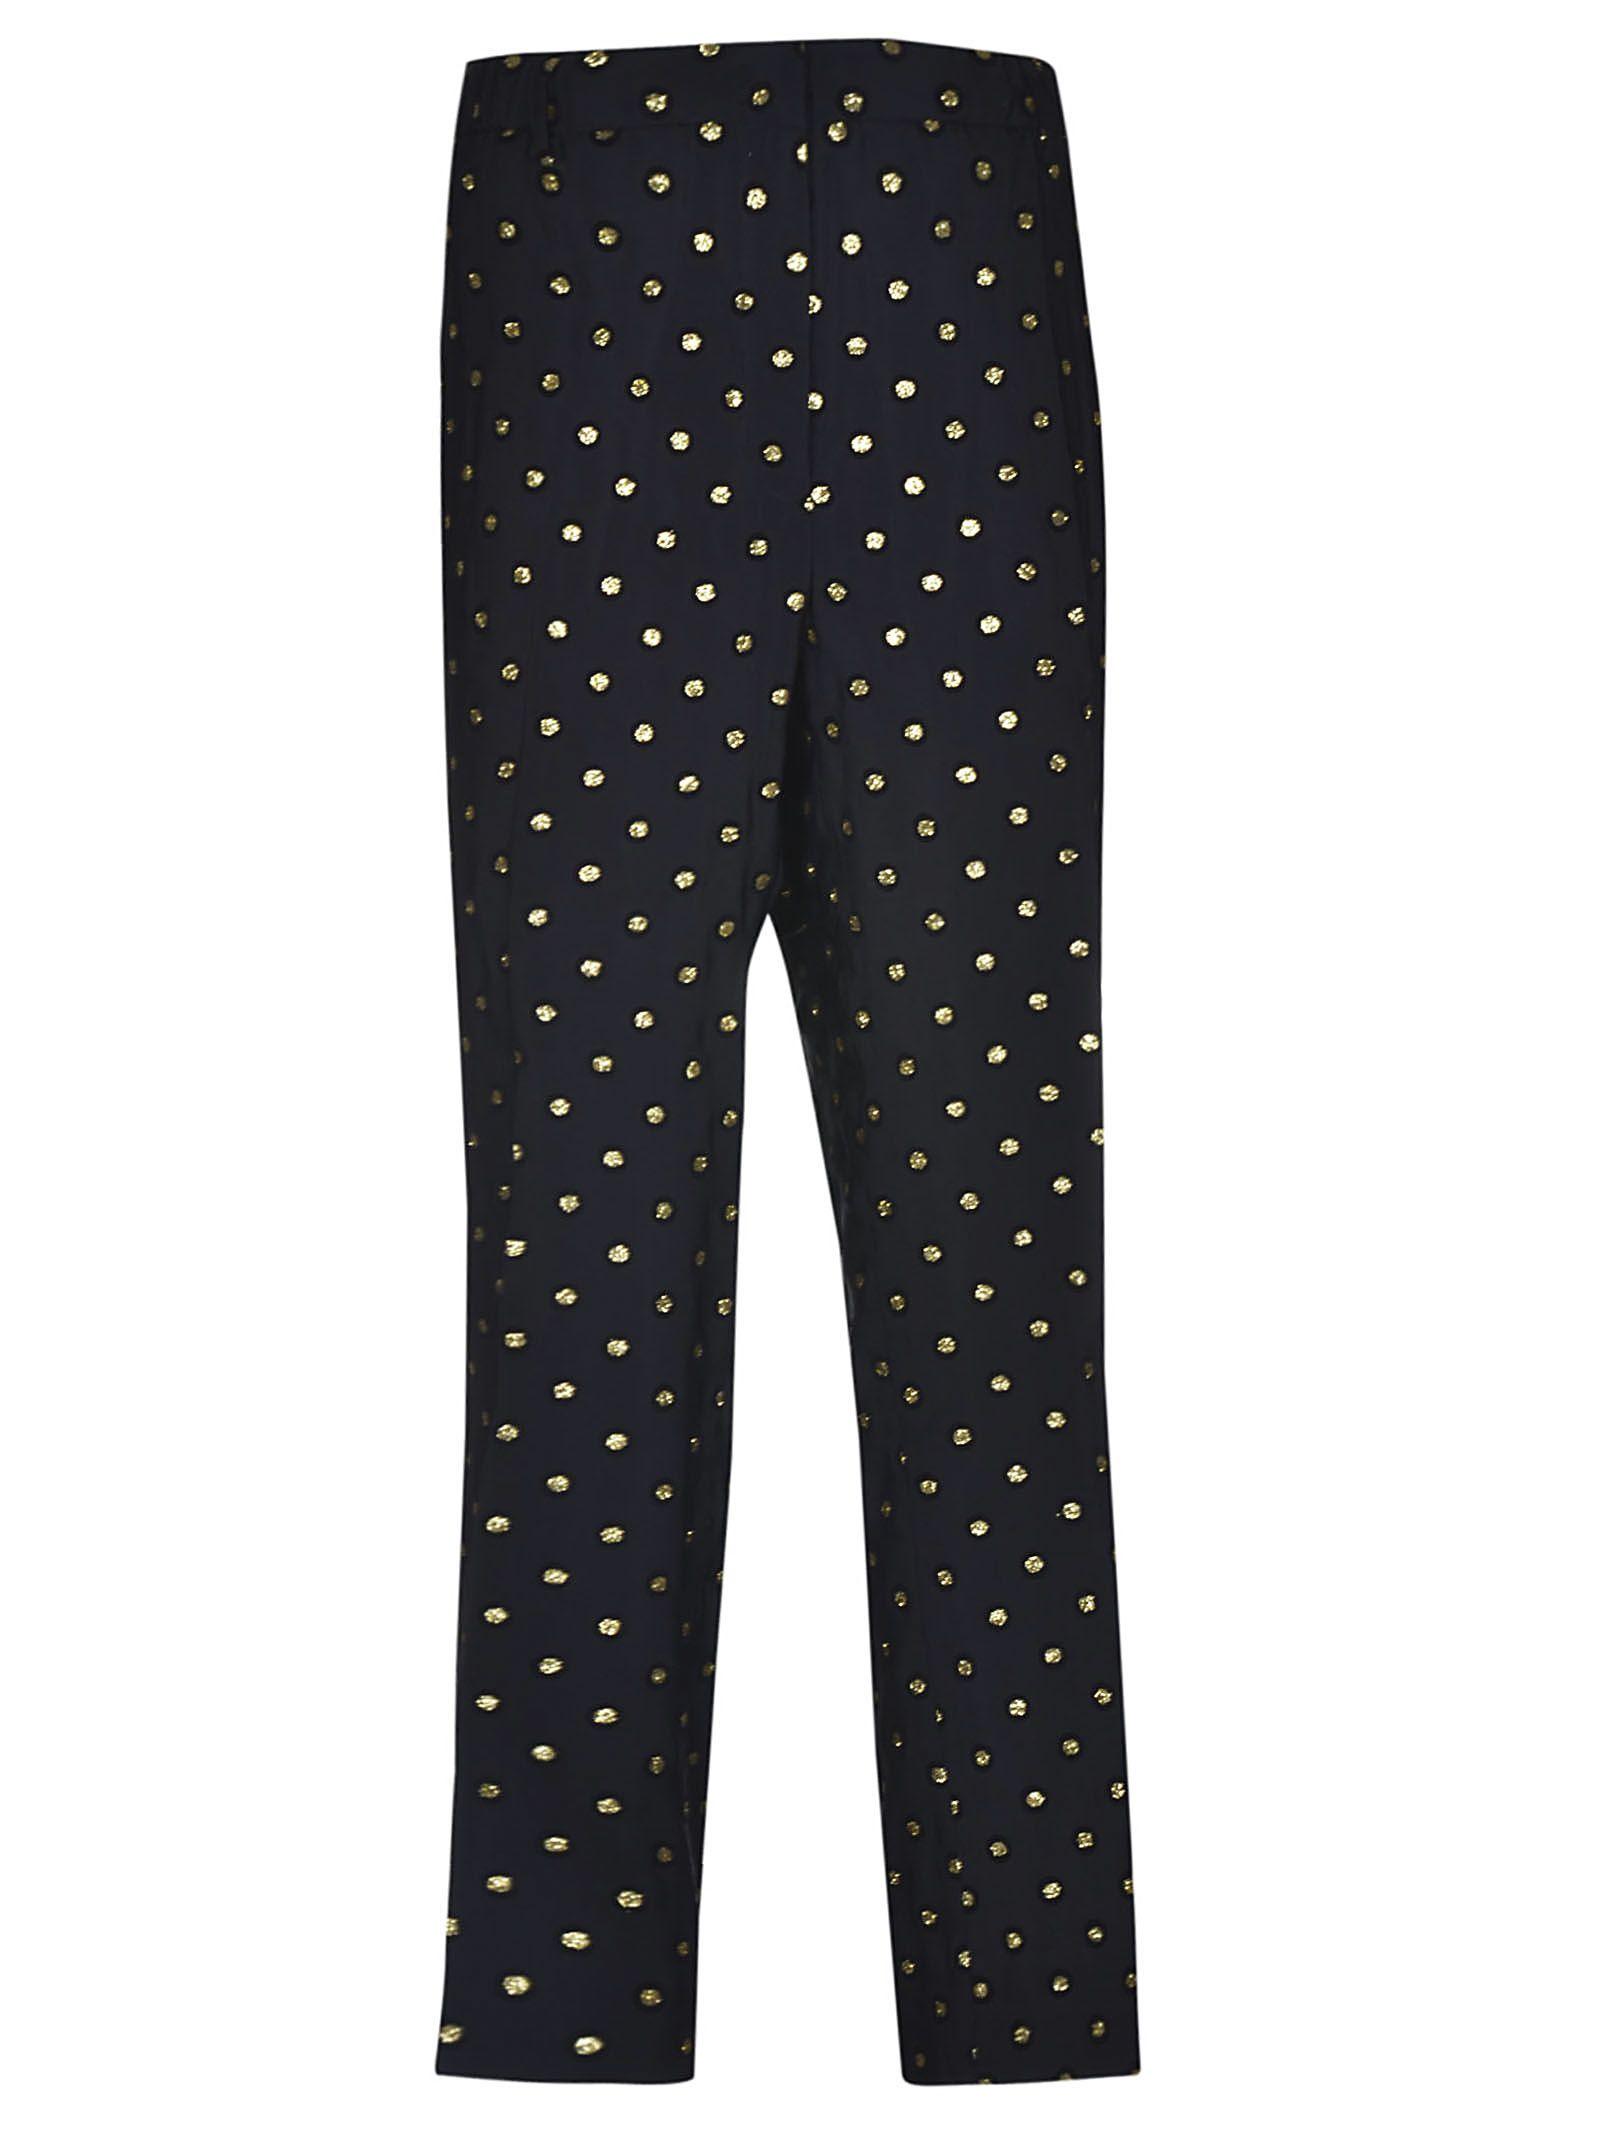 N.21 Embellished Trousers